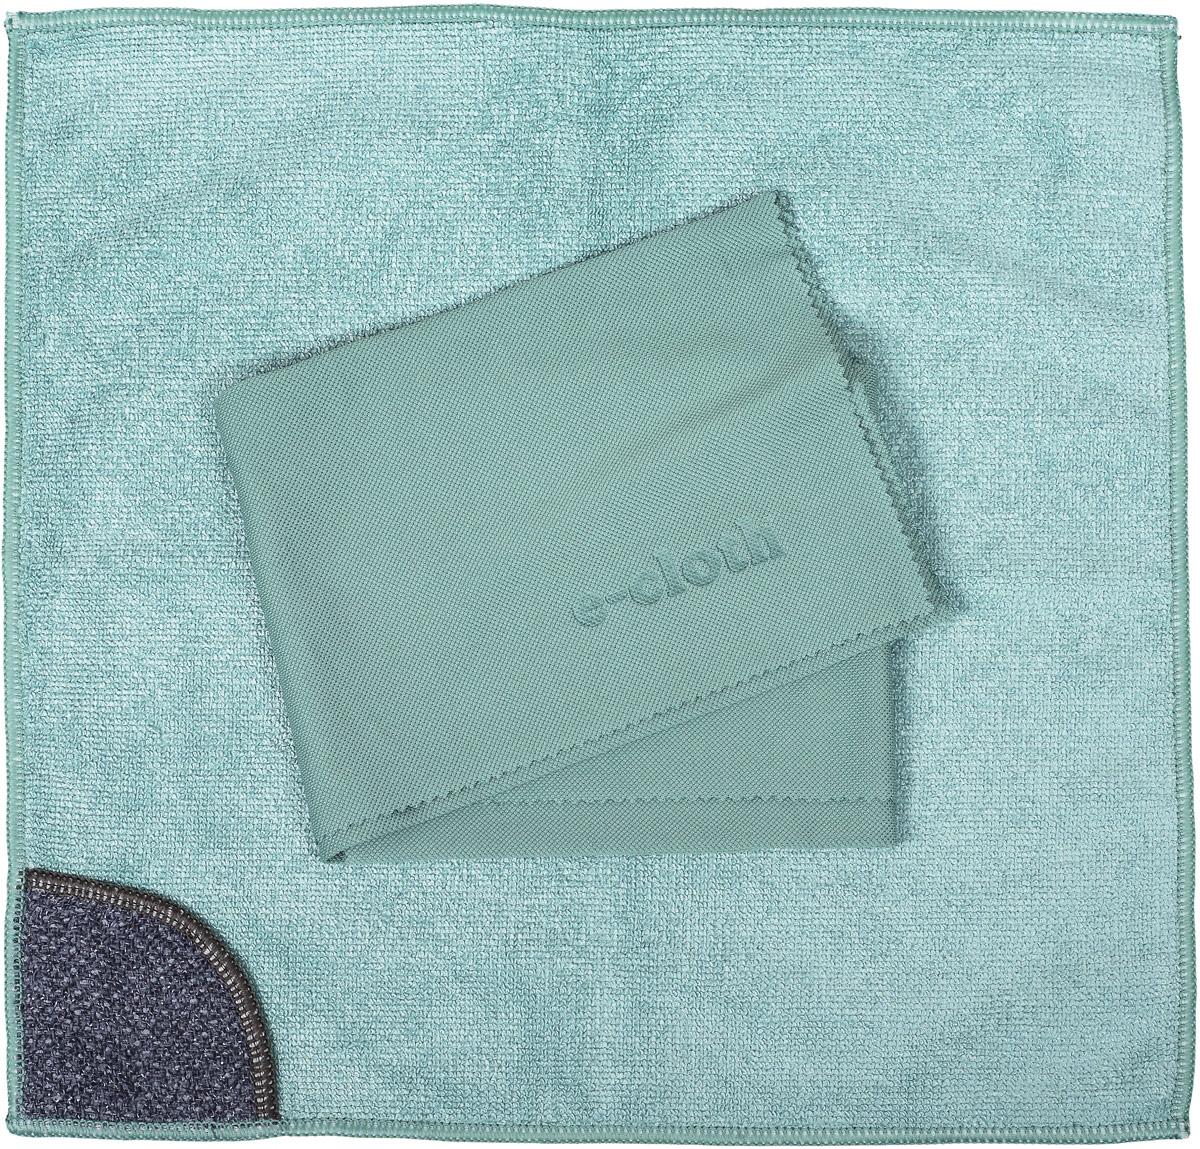 Набор салфеток E-cloth для кухни, цвет: зеленый, 2 шт20236_зеленыйНабор салфеток E-cloth для кухни, цвет: зеленый, 2 шт